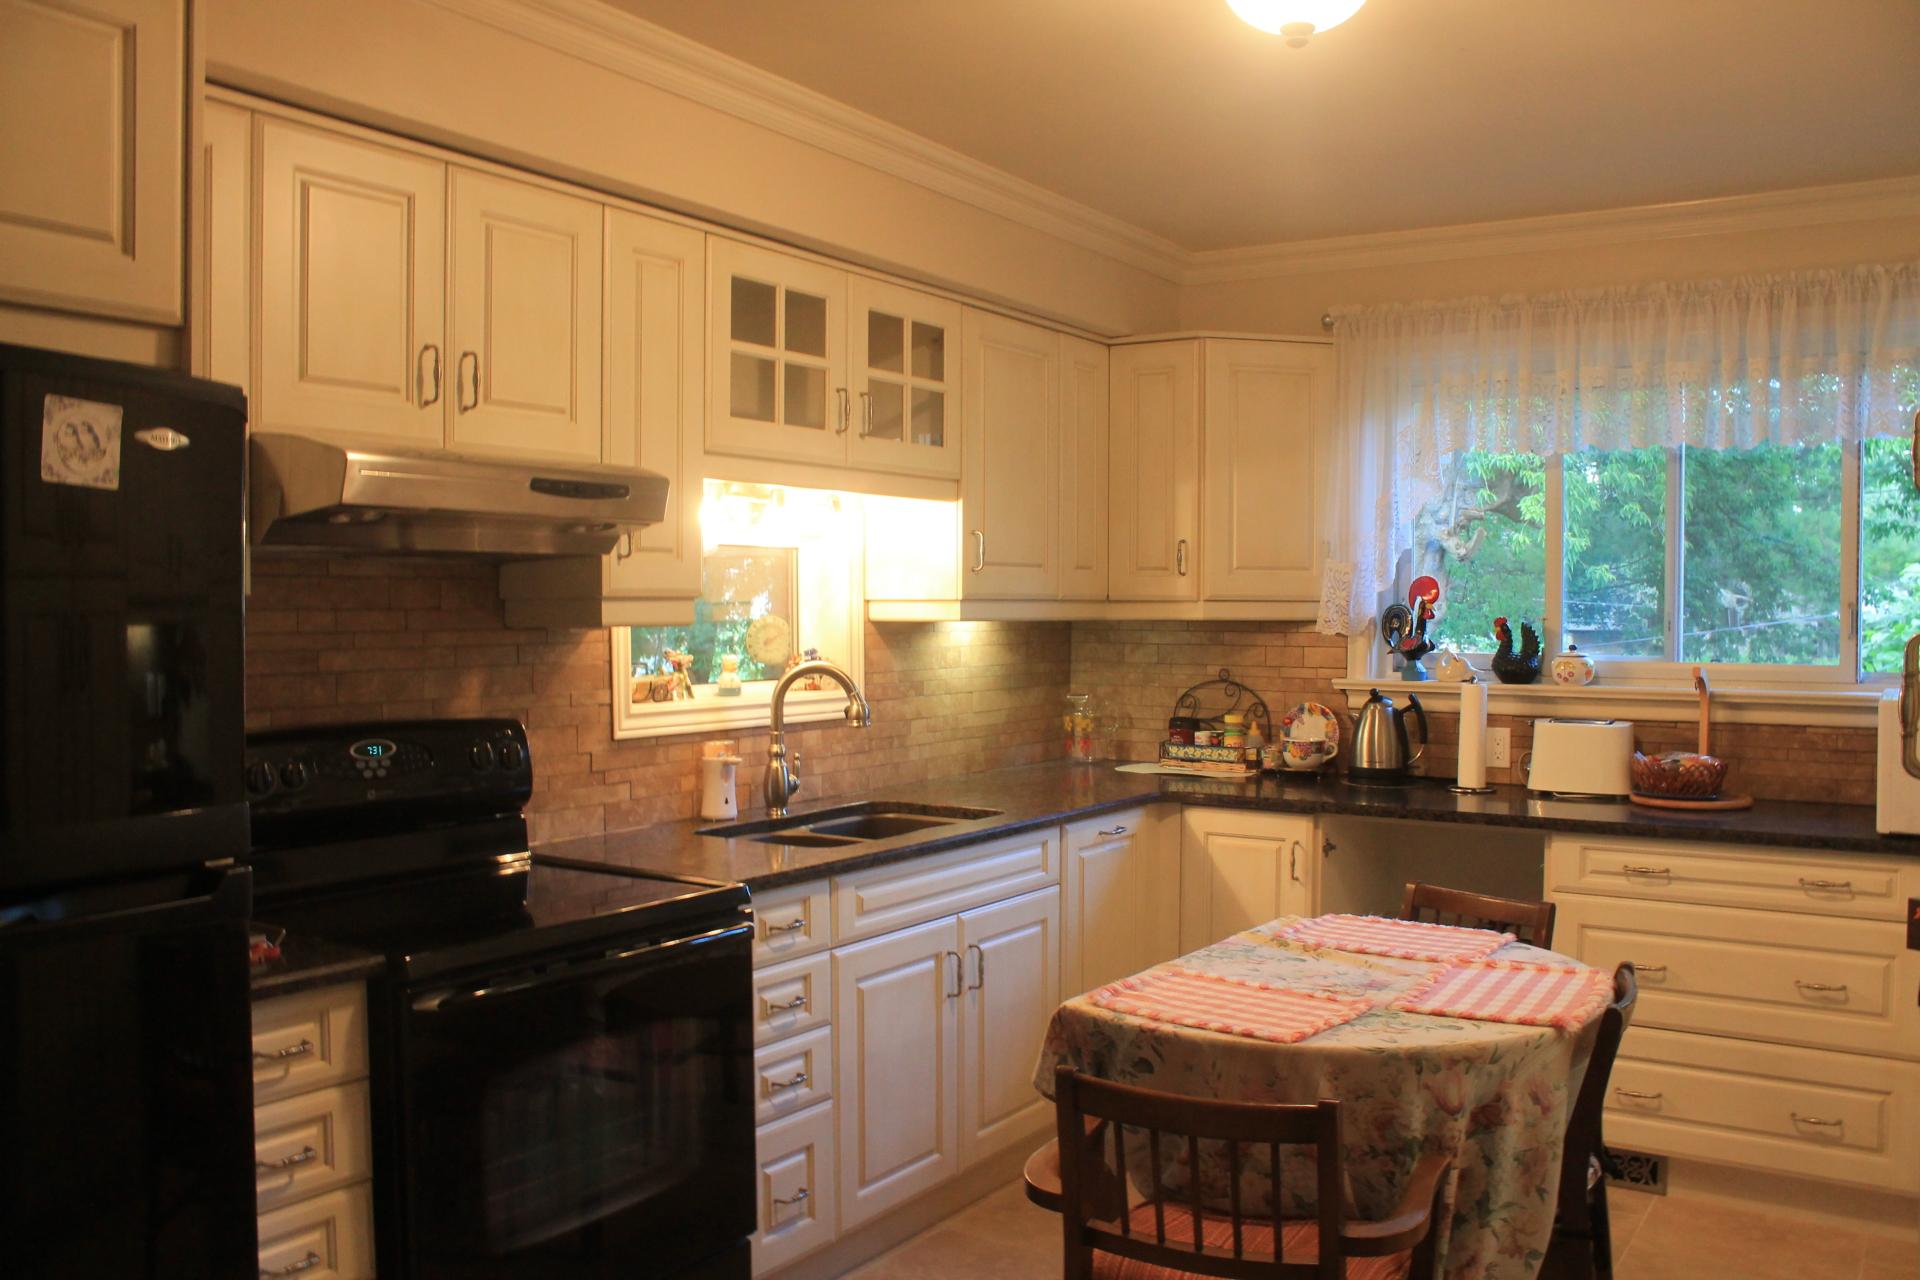 Kitchen cabinets Backsplash